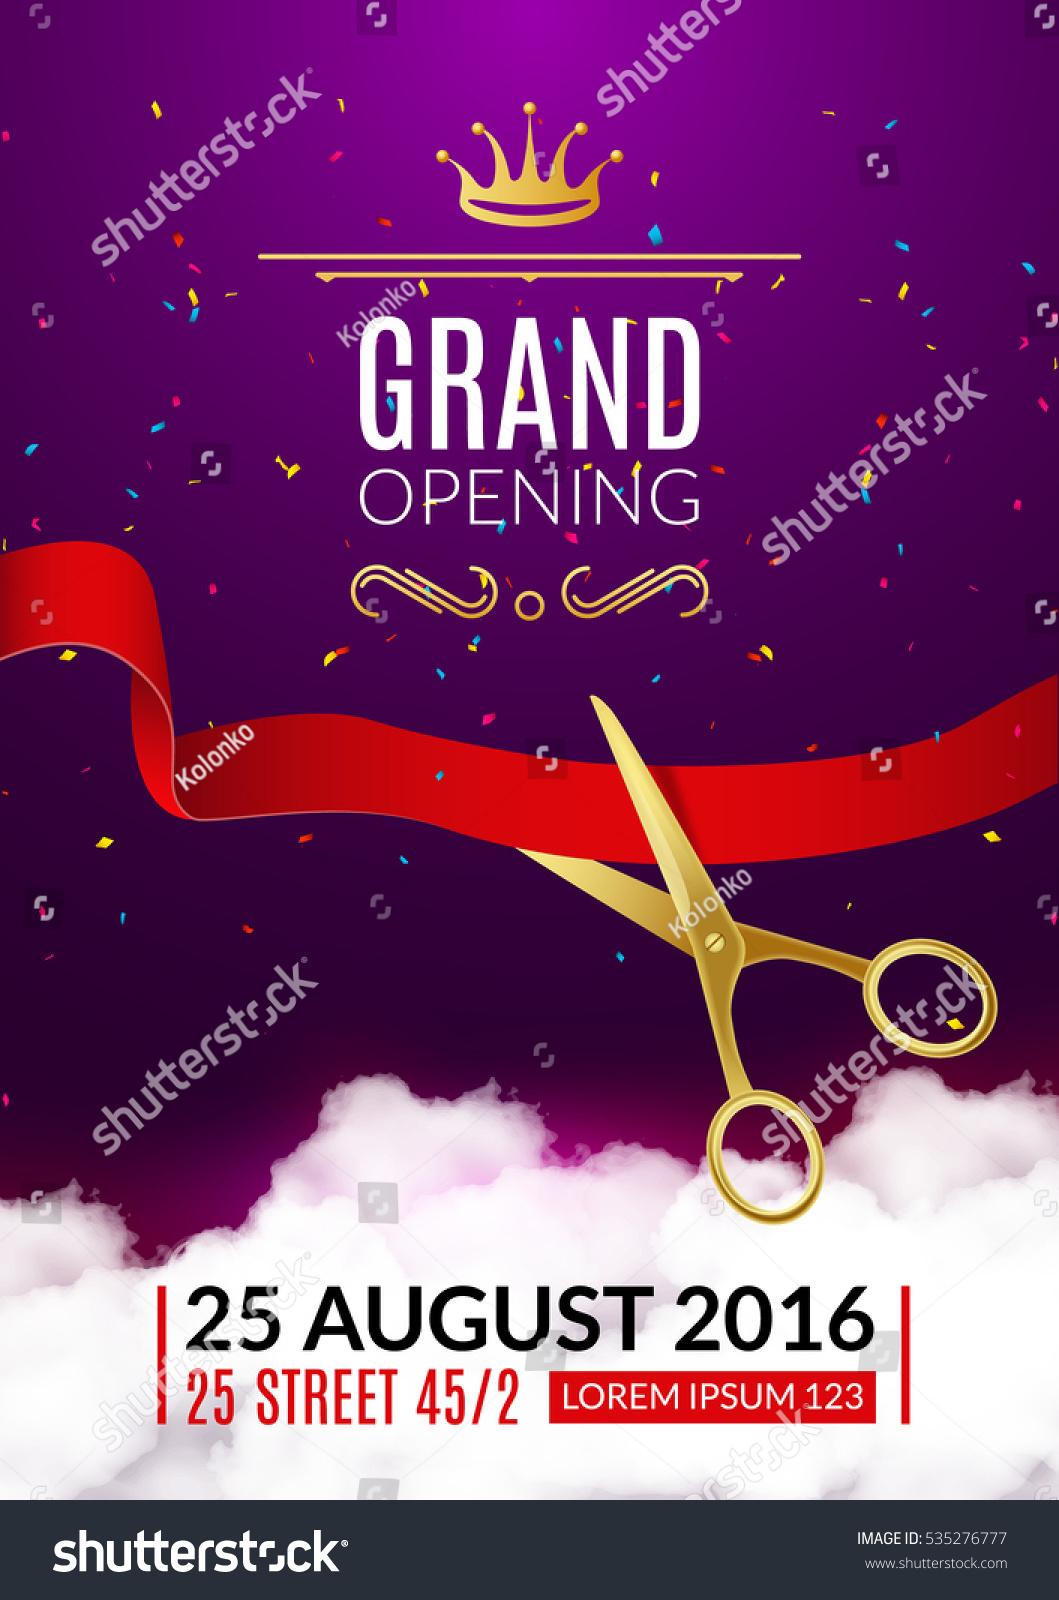 https www shutterstock com de image vector grand opening invitation card event flyer 535276777